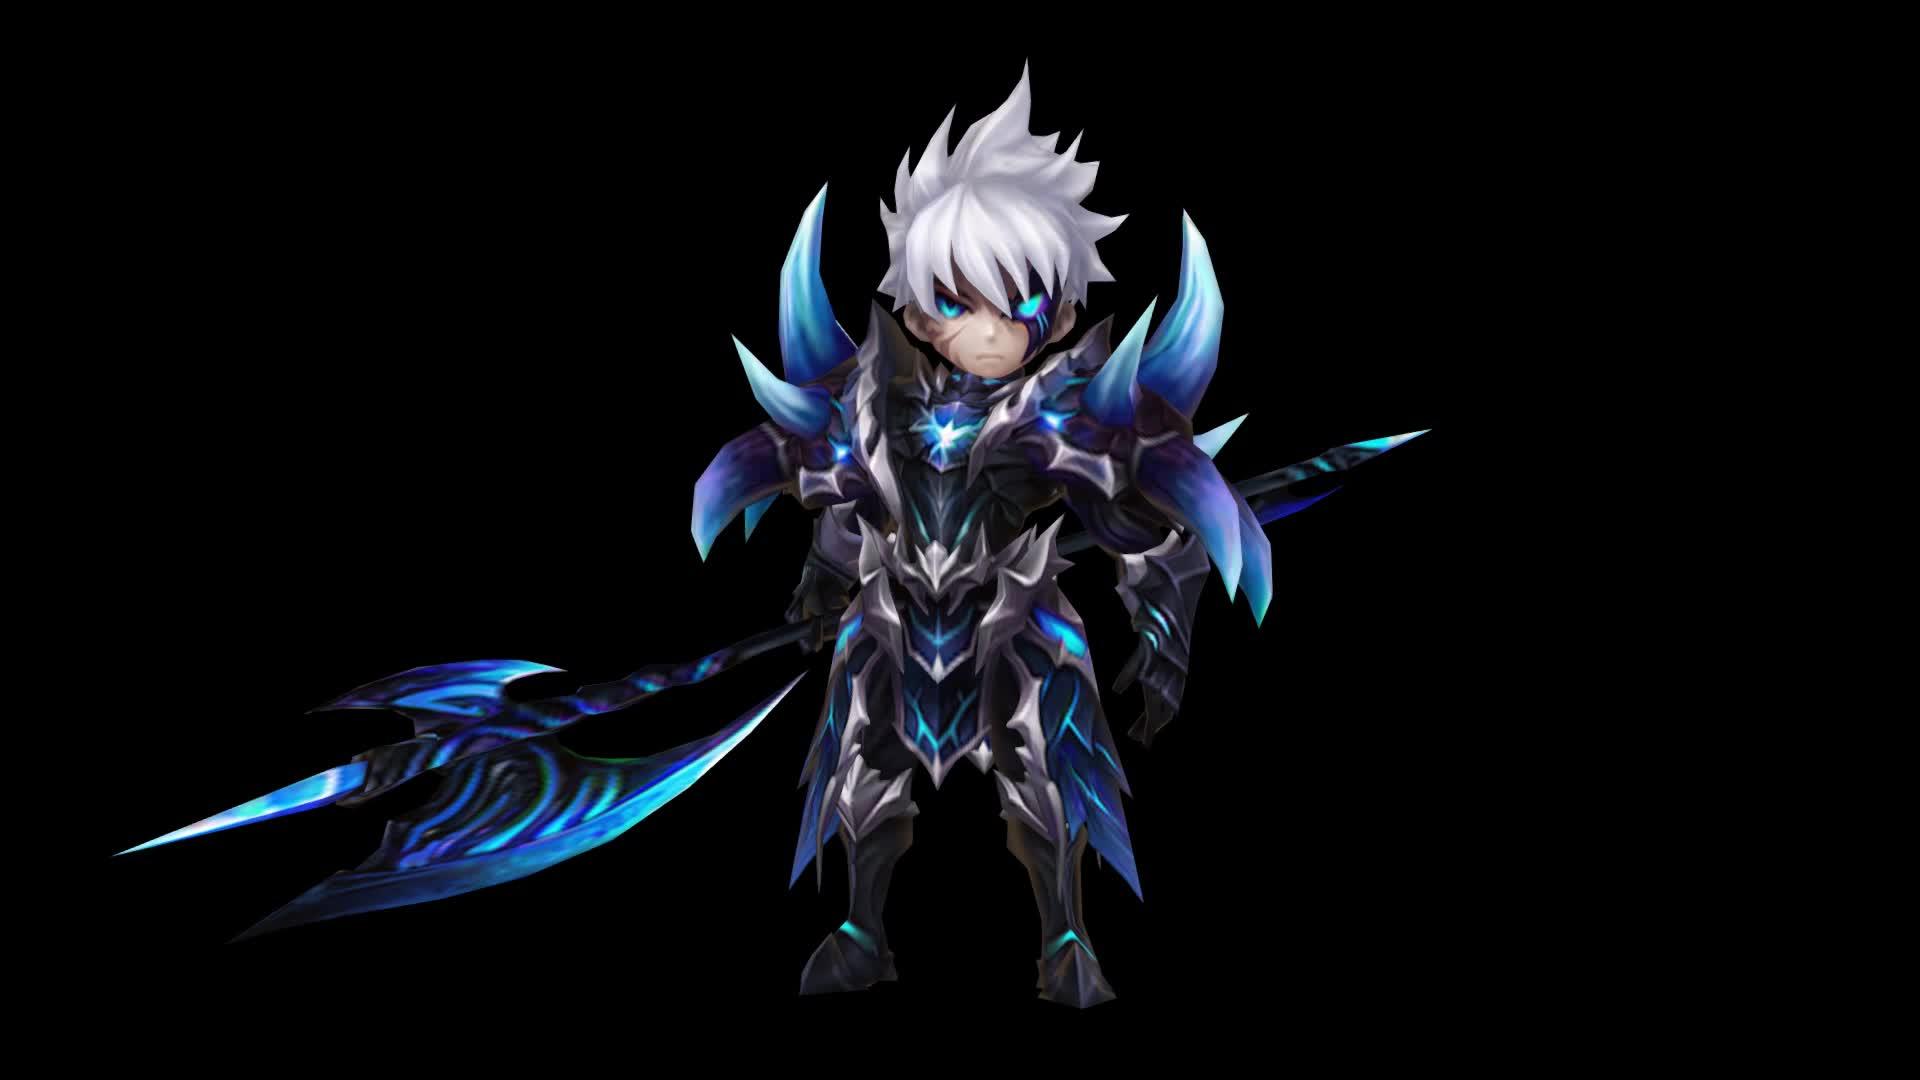 summonerswar, Dragon Knight GIFs